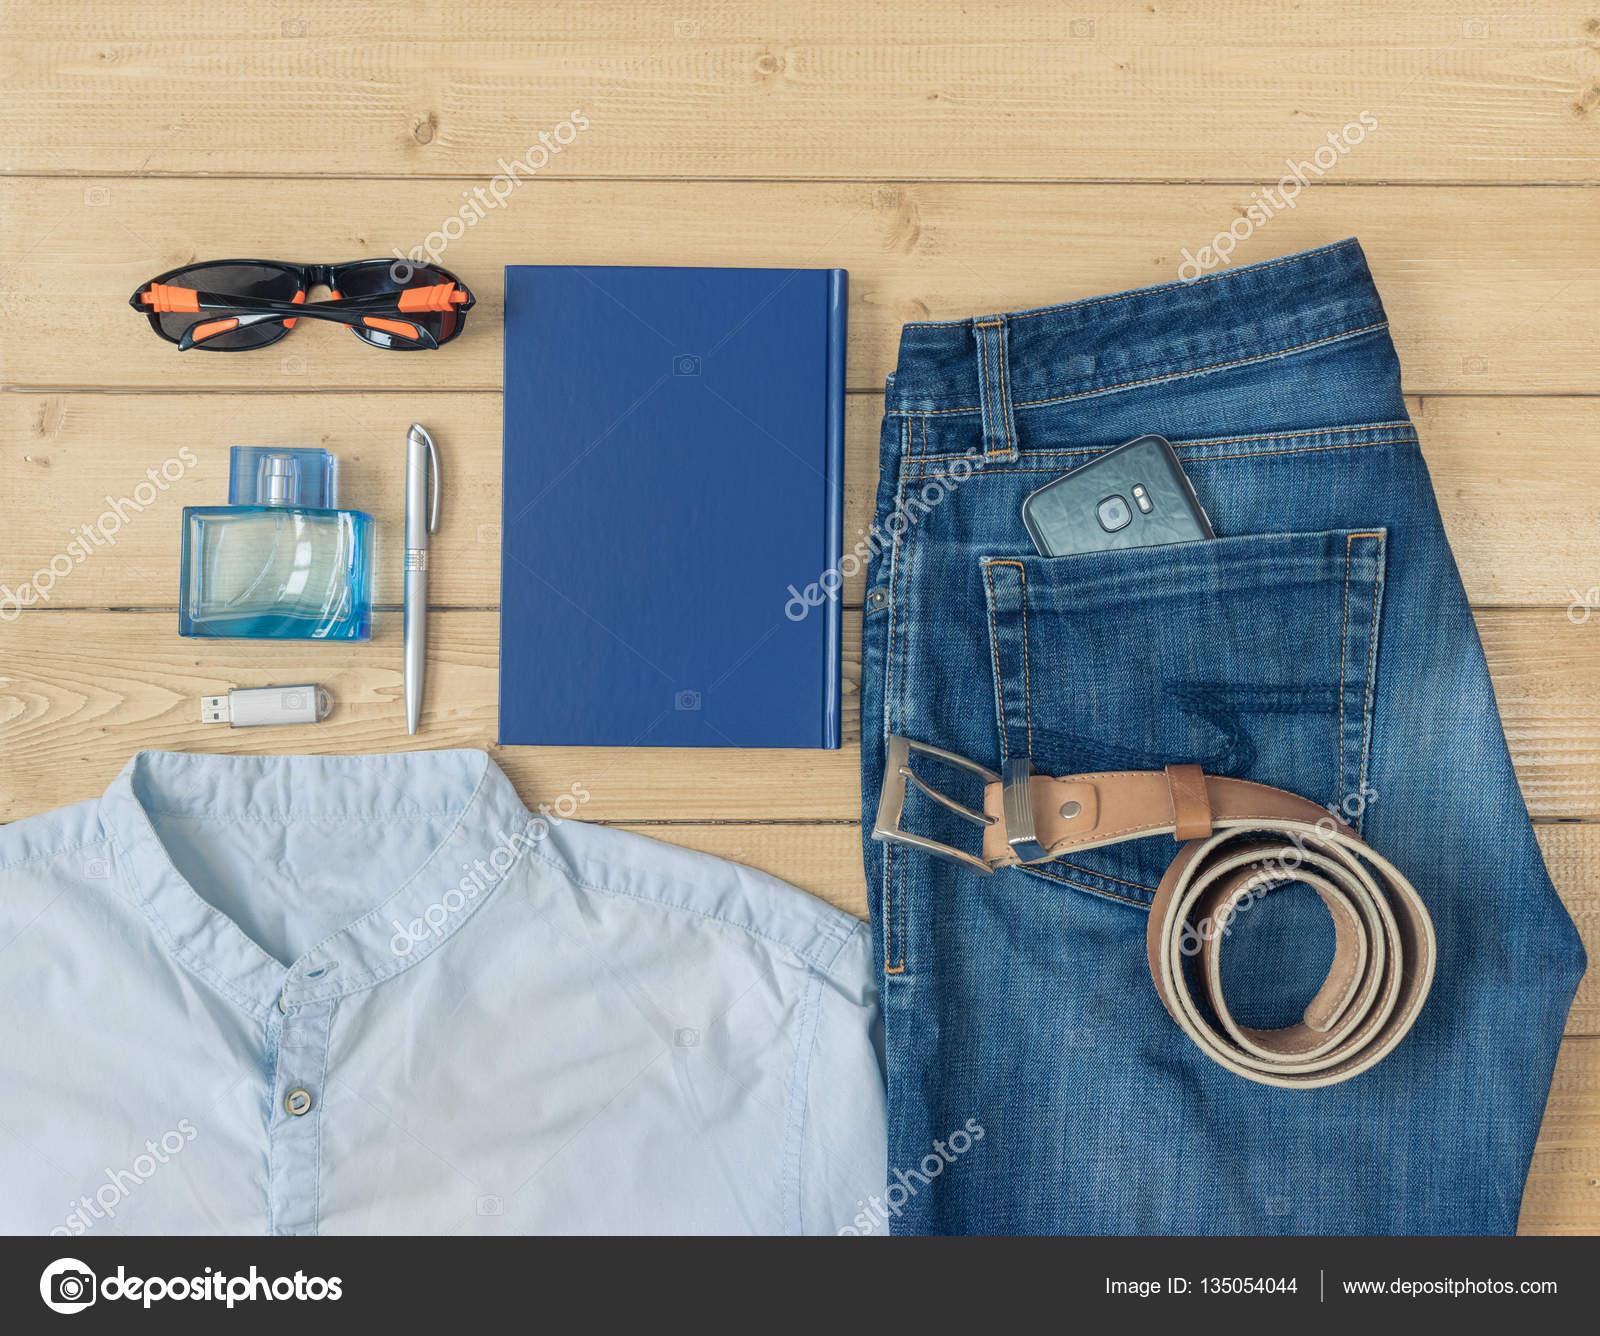 0afdd0333477 Ανδρικά ρούχα και αξεσουάρ με το ξύλινο πάτωμα — Φωτογραφία Αρχείου ...